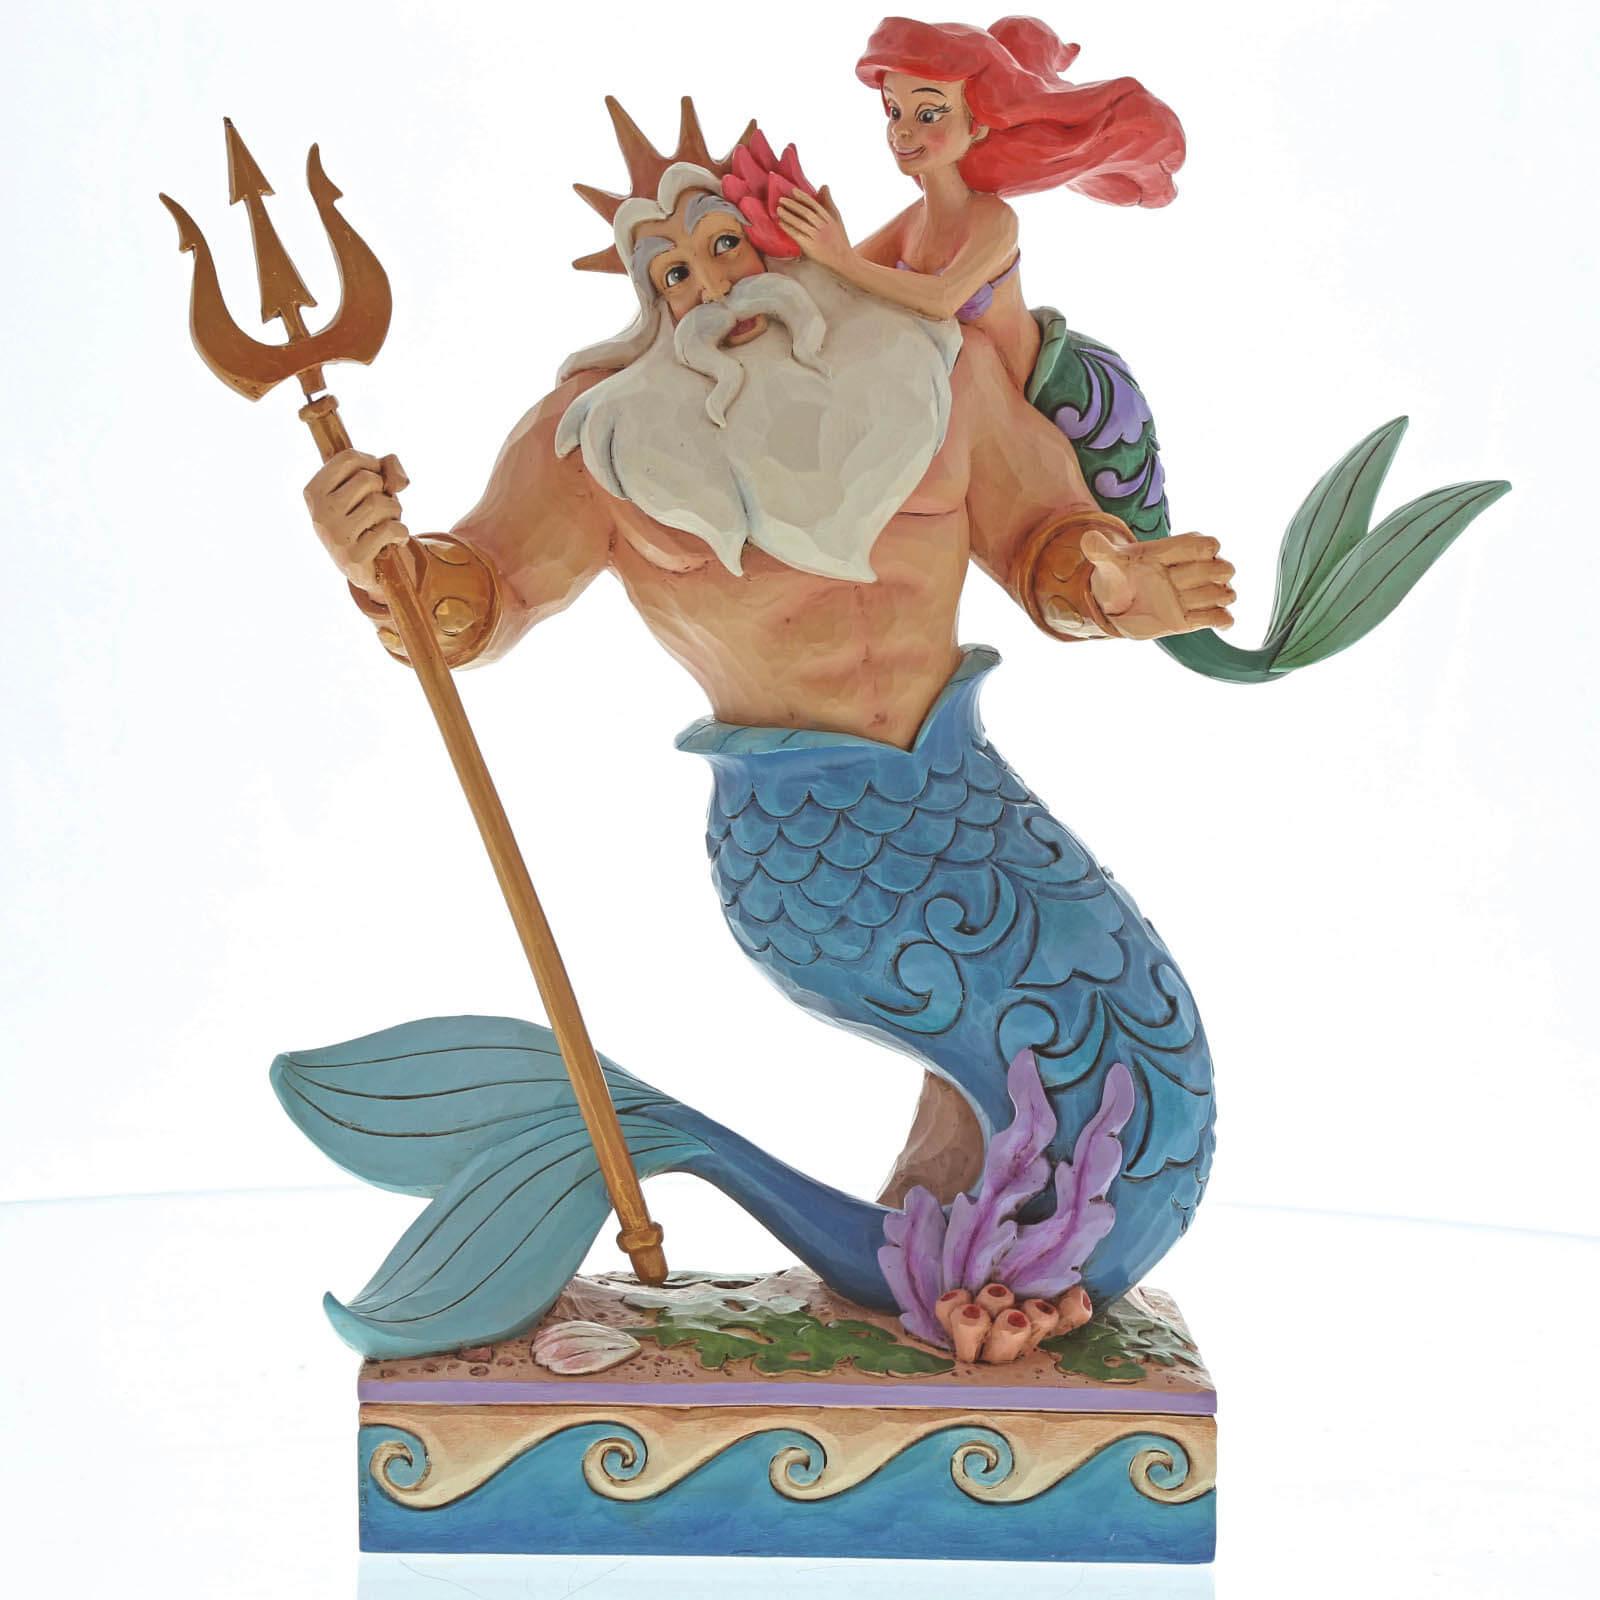 Image of Enesco Disney Traditions Daddy's Little Princess - Ariel and Triton Figurine 25cm